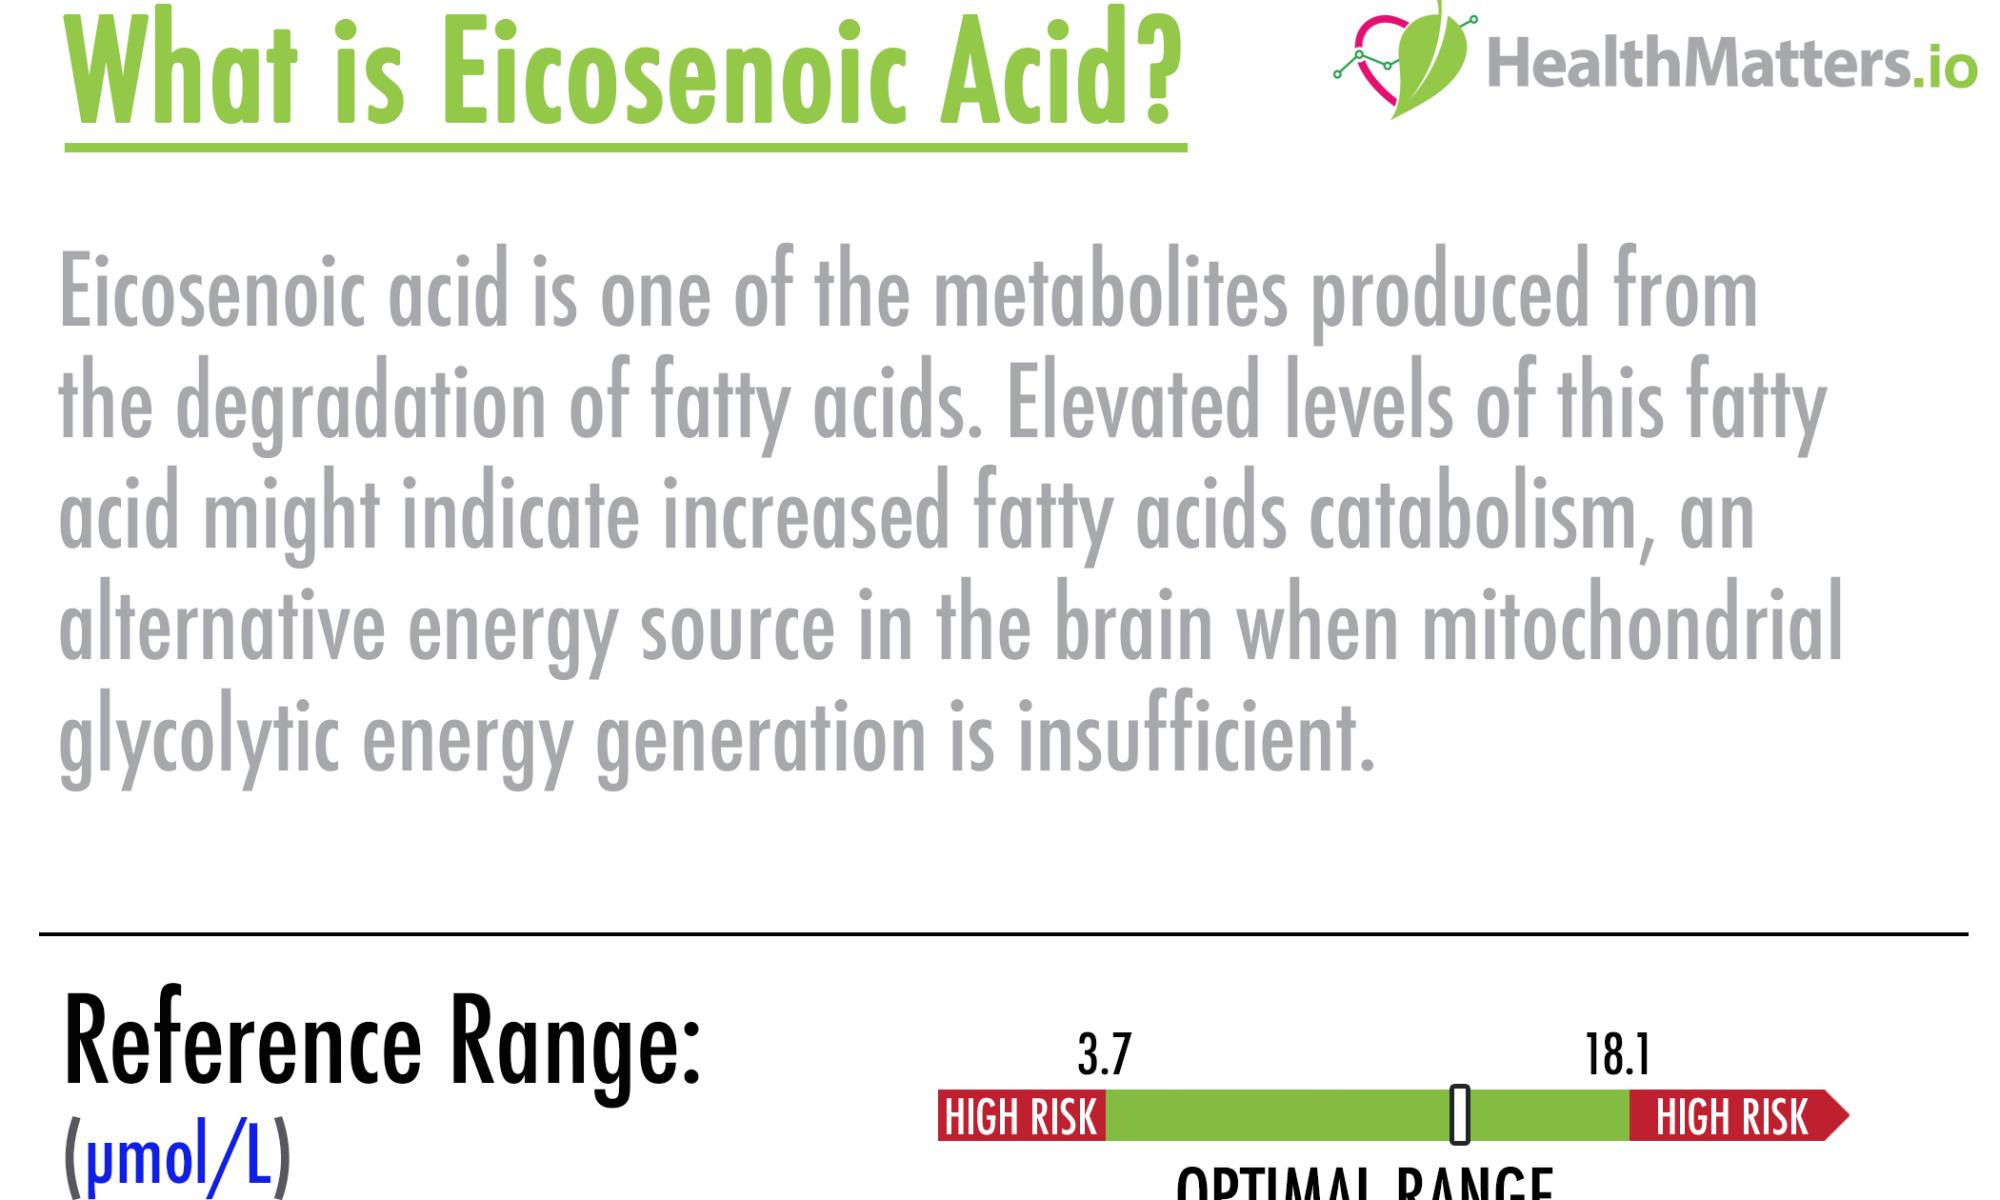 eicosenoic acid high low